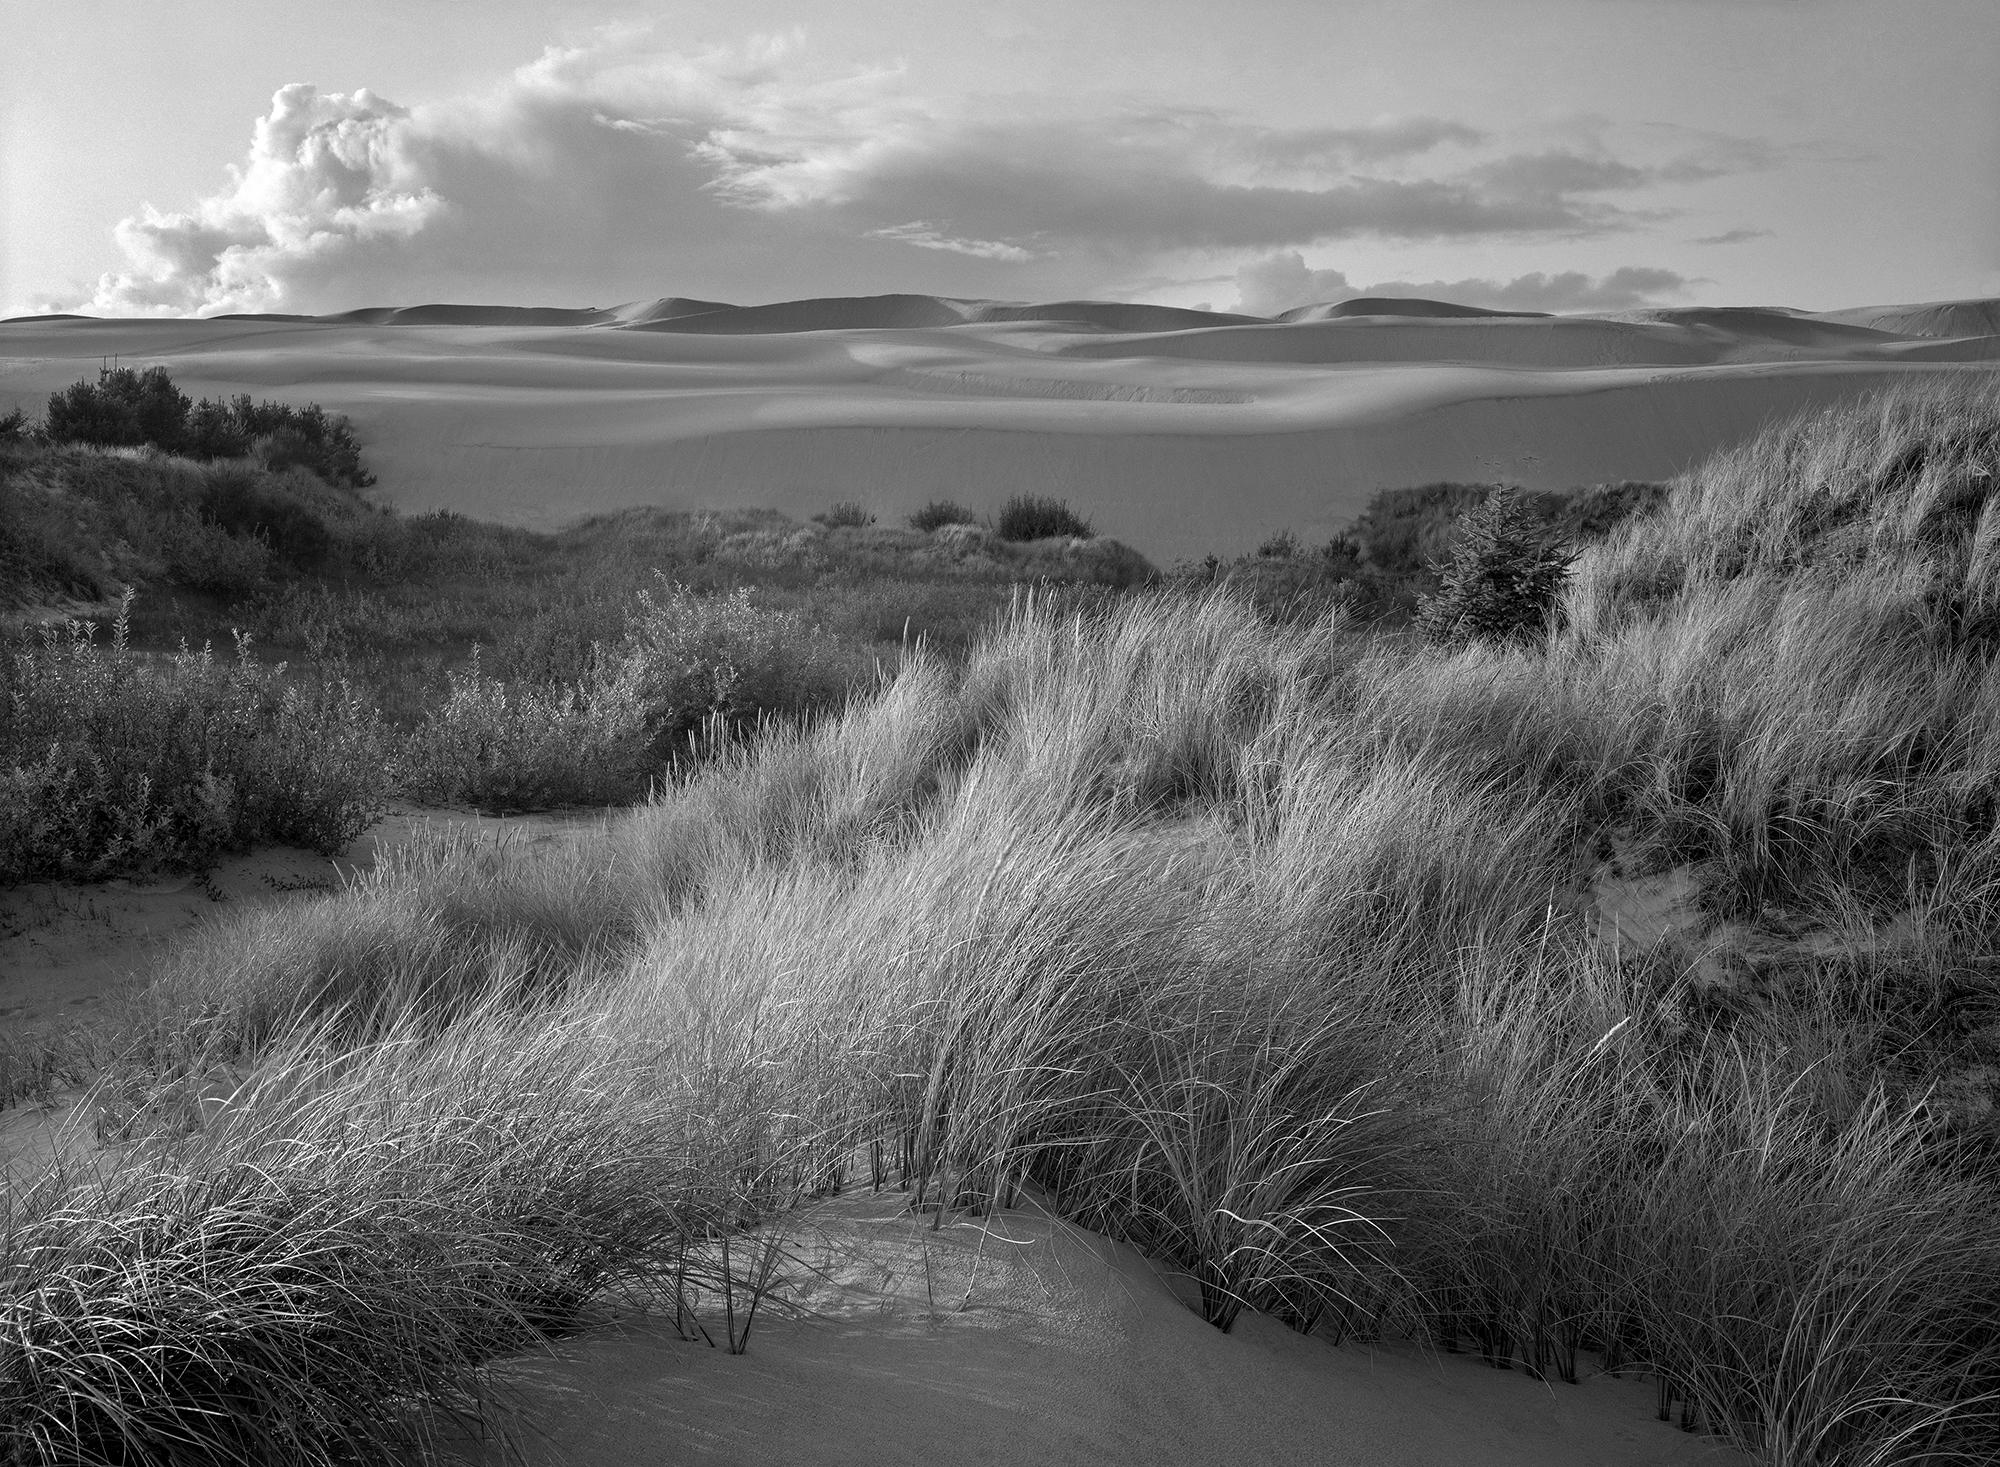 Oregon Dunes 1985 - Arthur Lazar